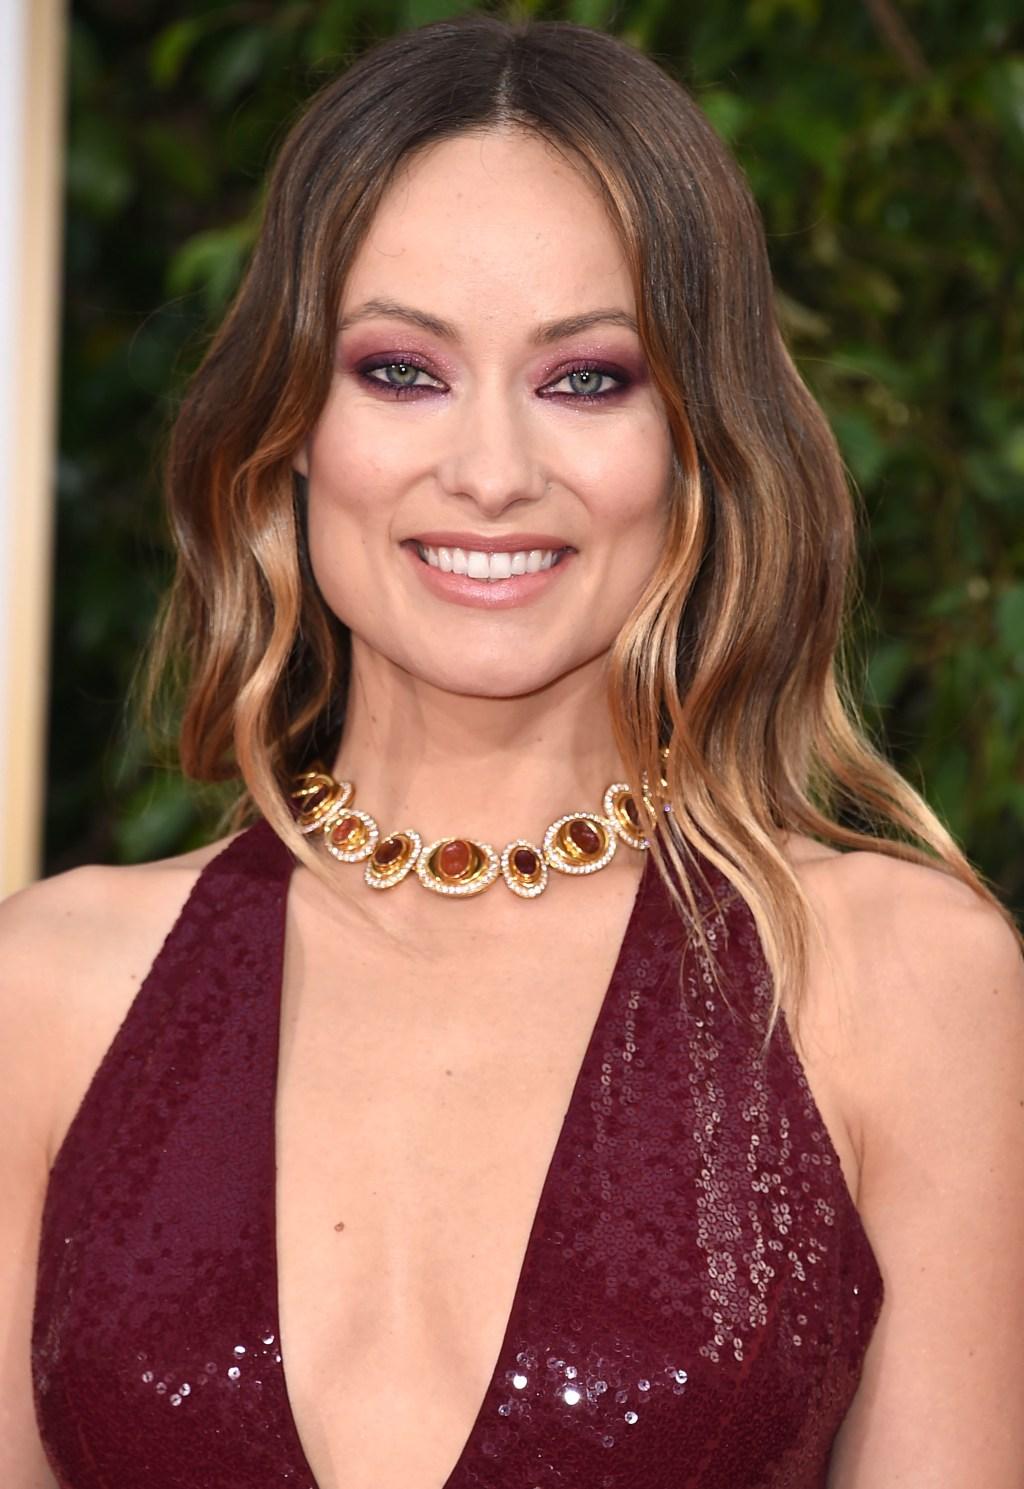 Olivia Wilde, 2016 Golden Globes, jewelry